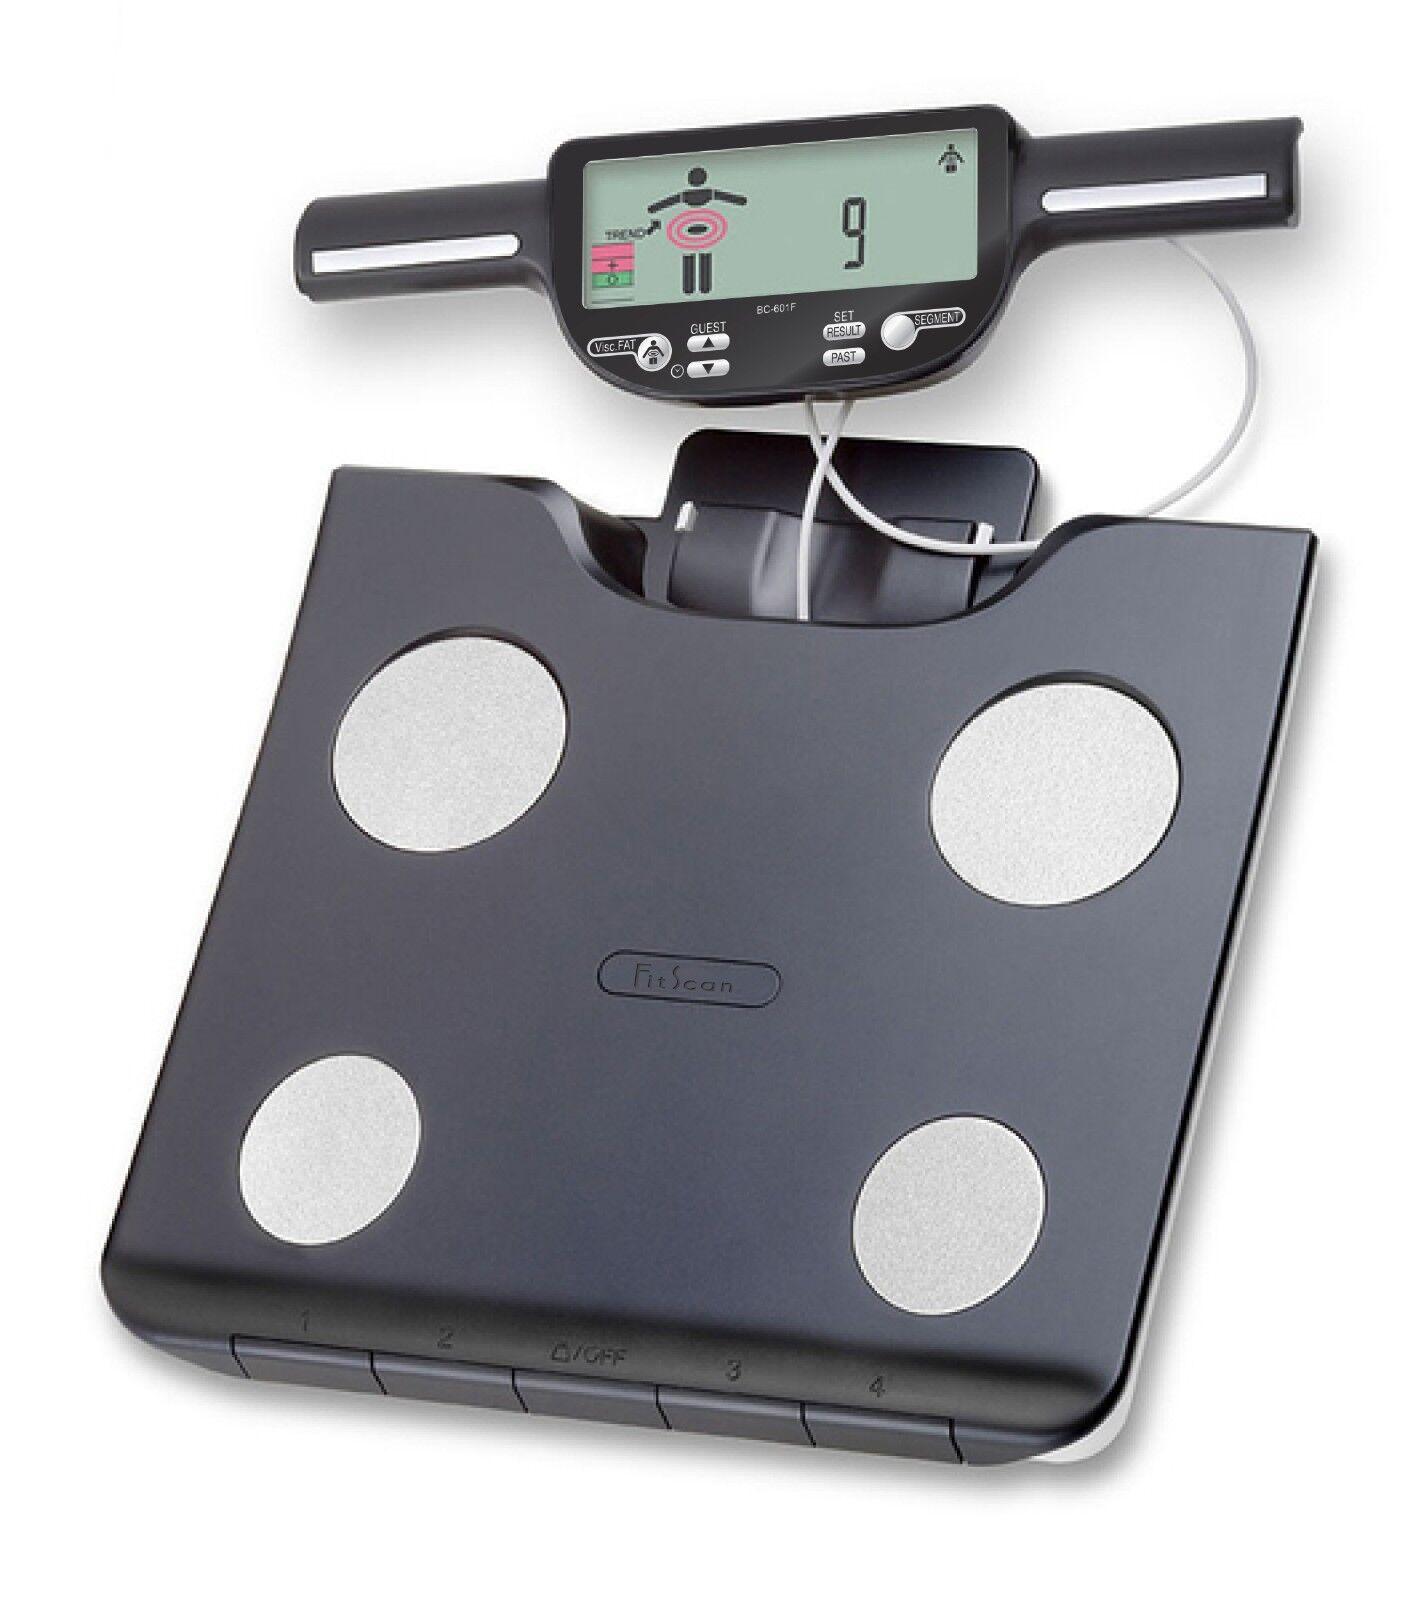 Tanita bathroom scales - Tanita Bathroom Scales 31